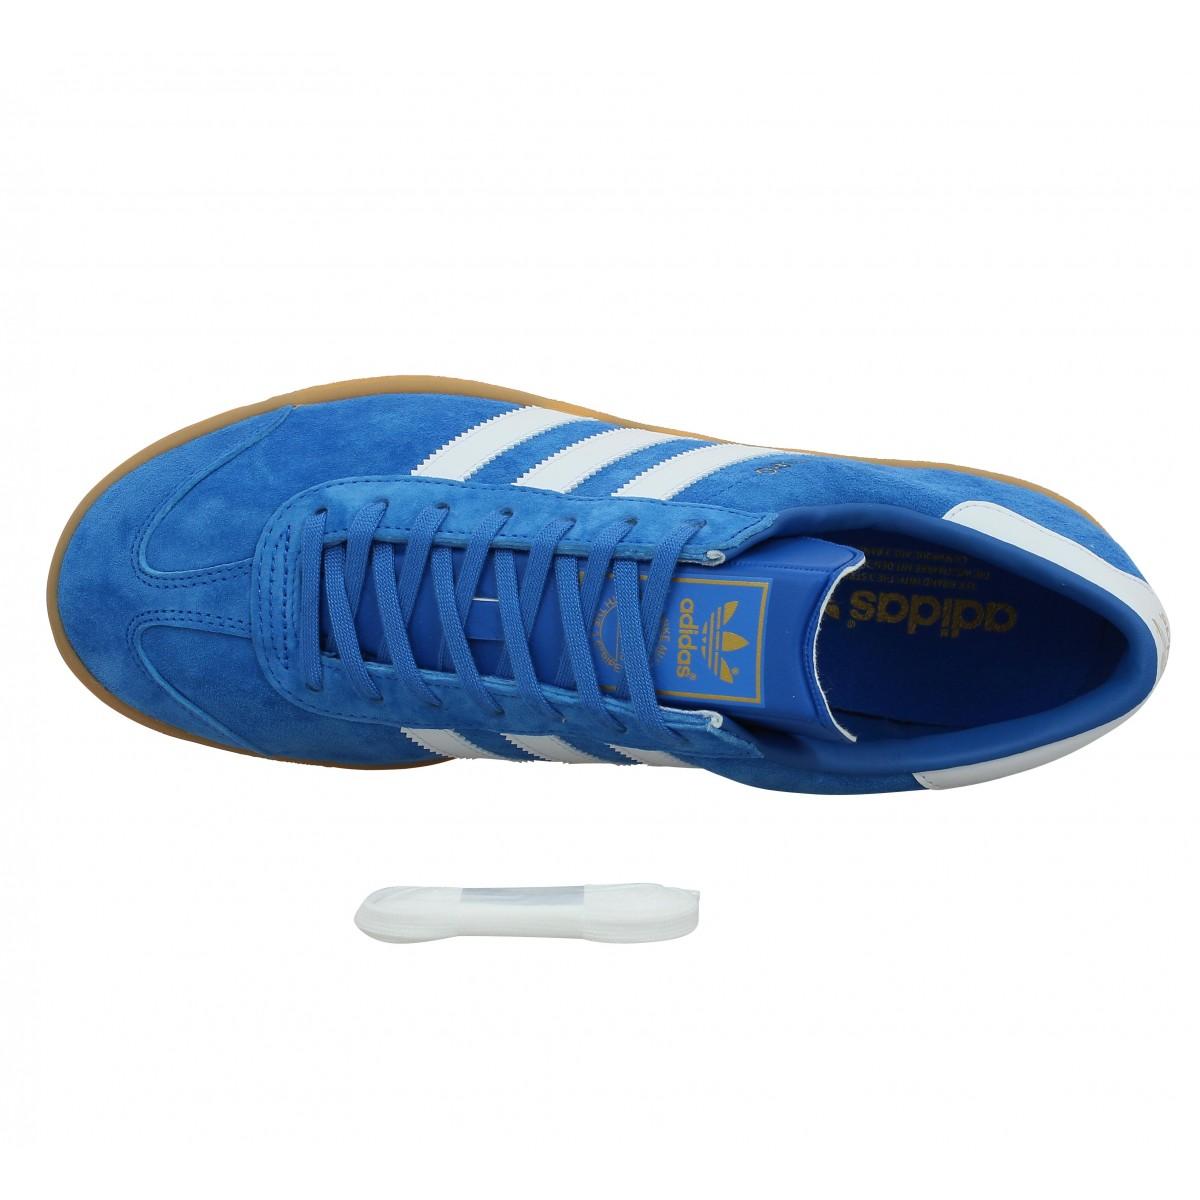 Adidas hamburg bleu homme | Fanny chaussures